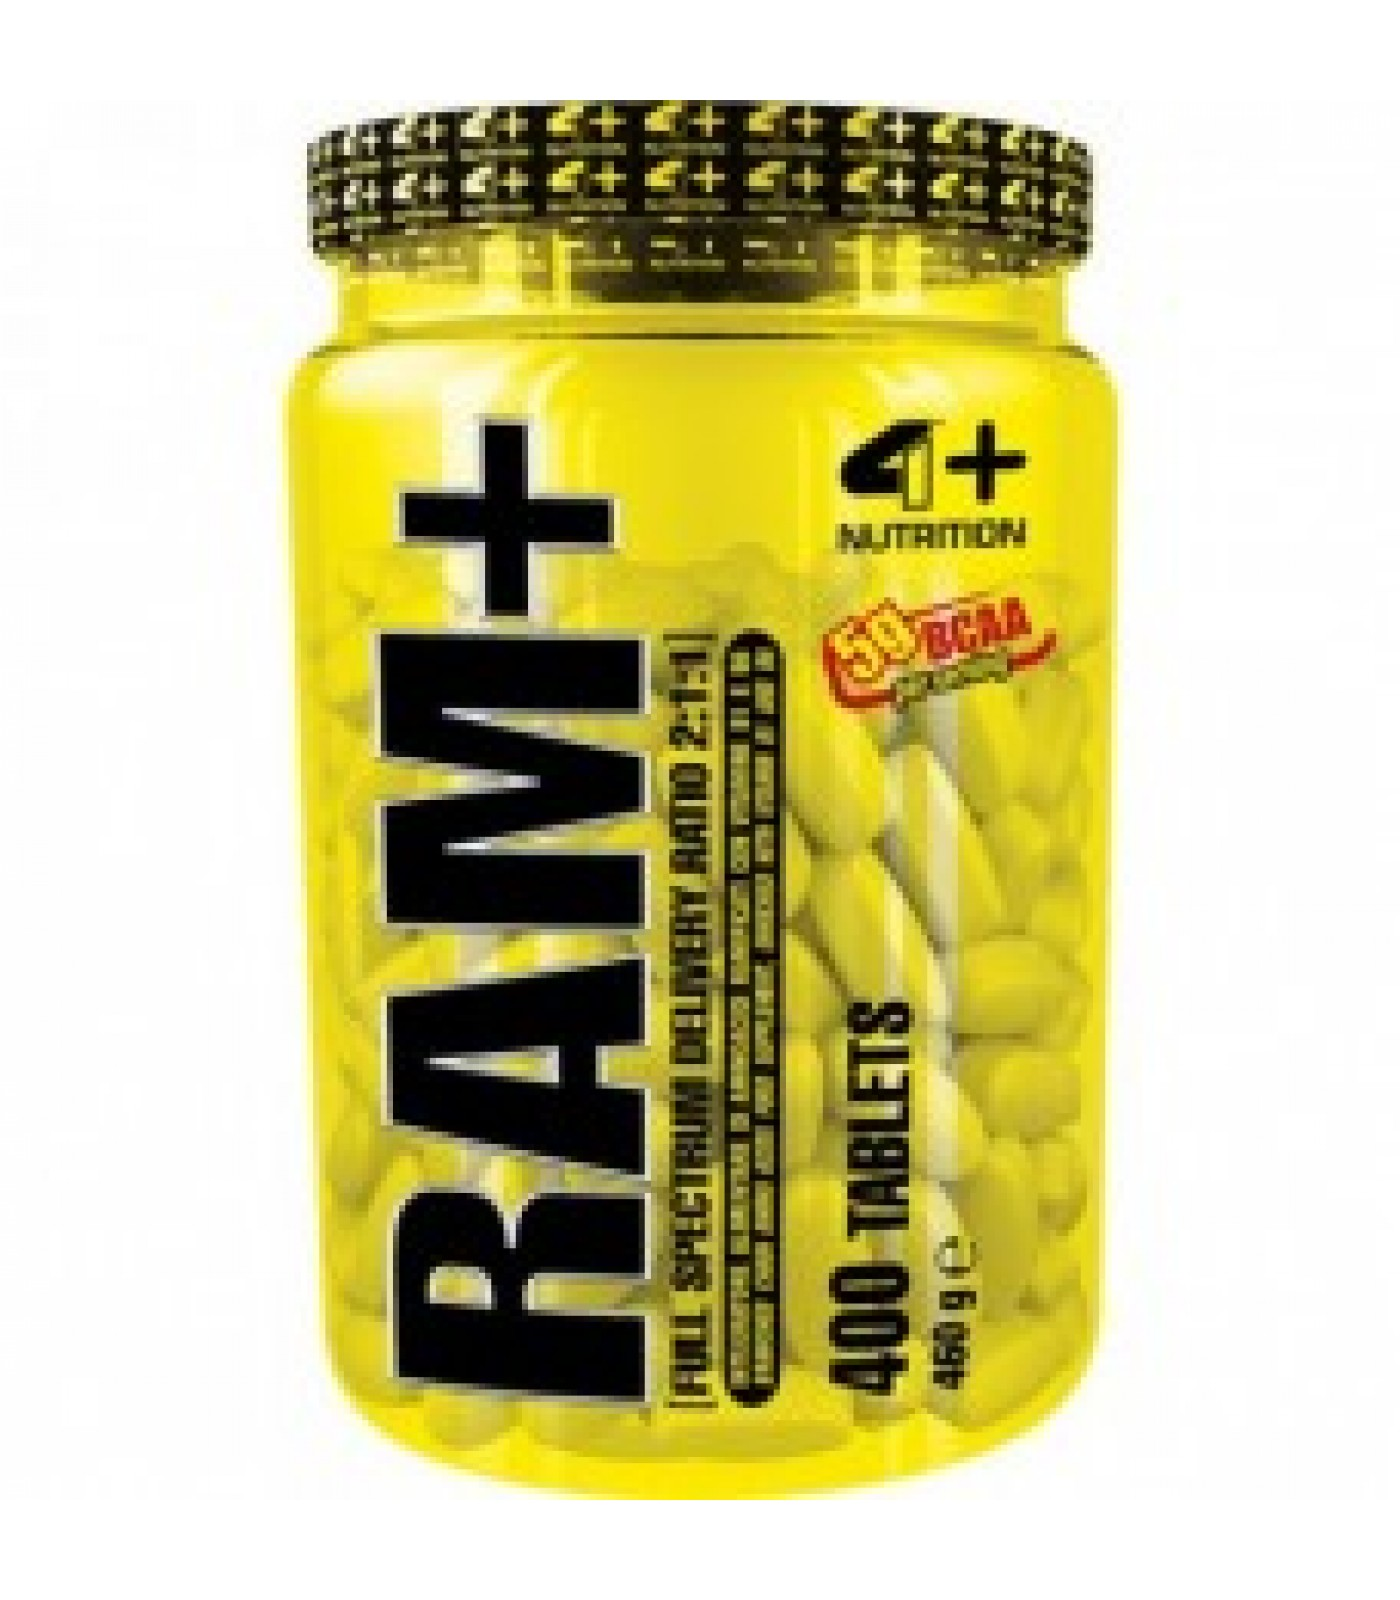 4+ Nutrition RAM+ 100 табл.